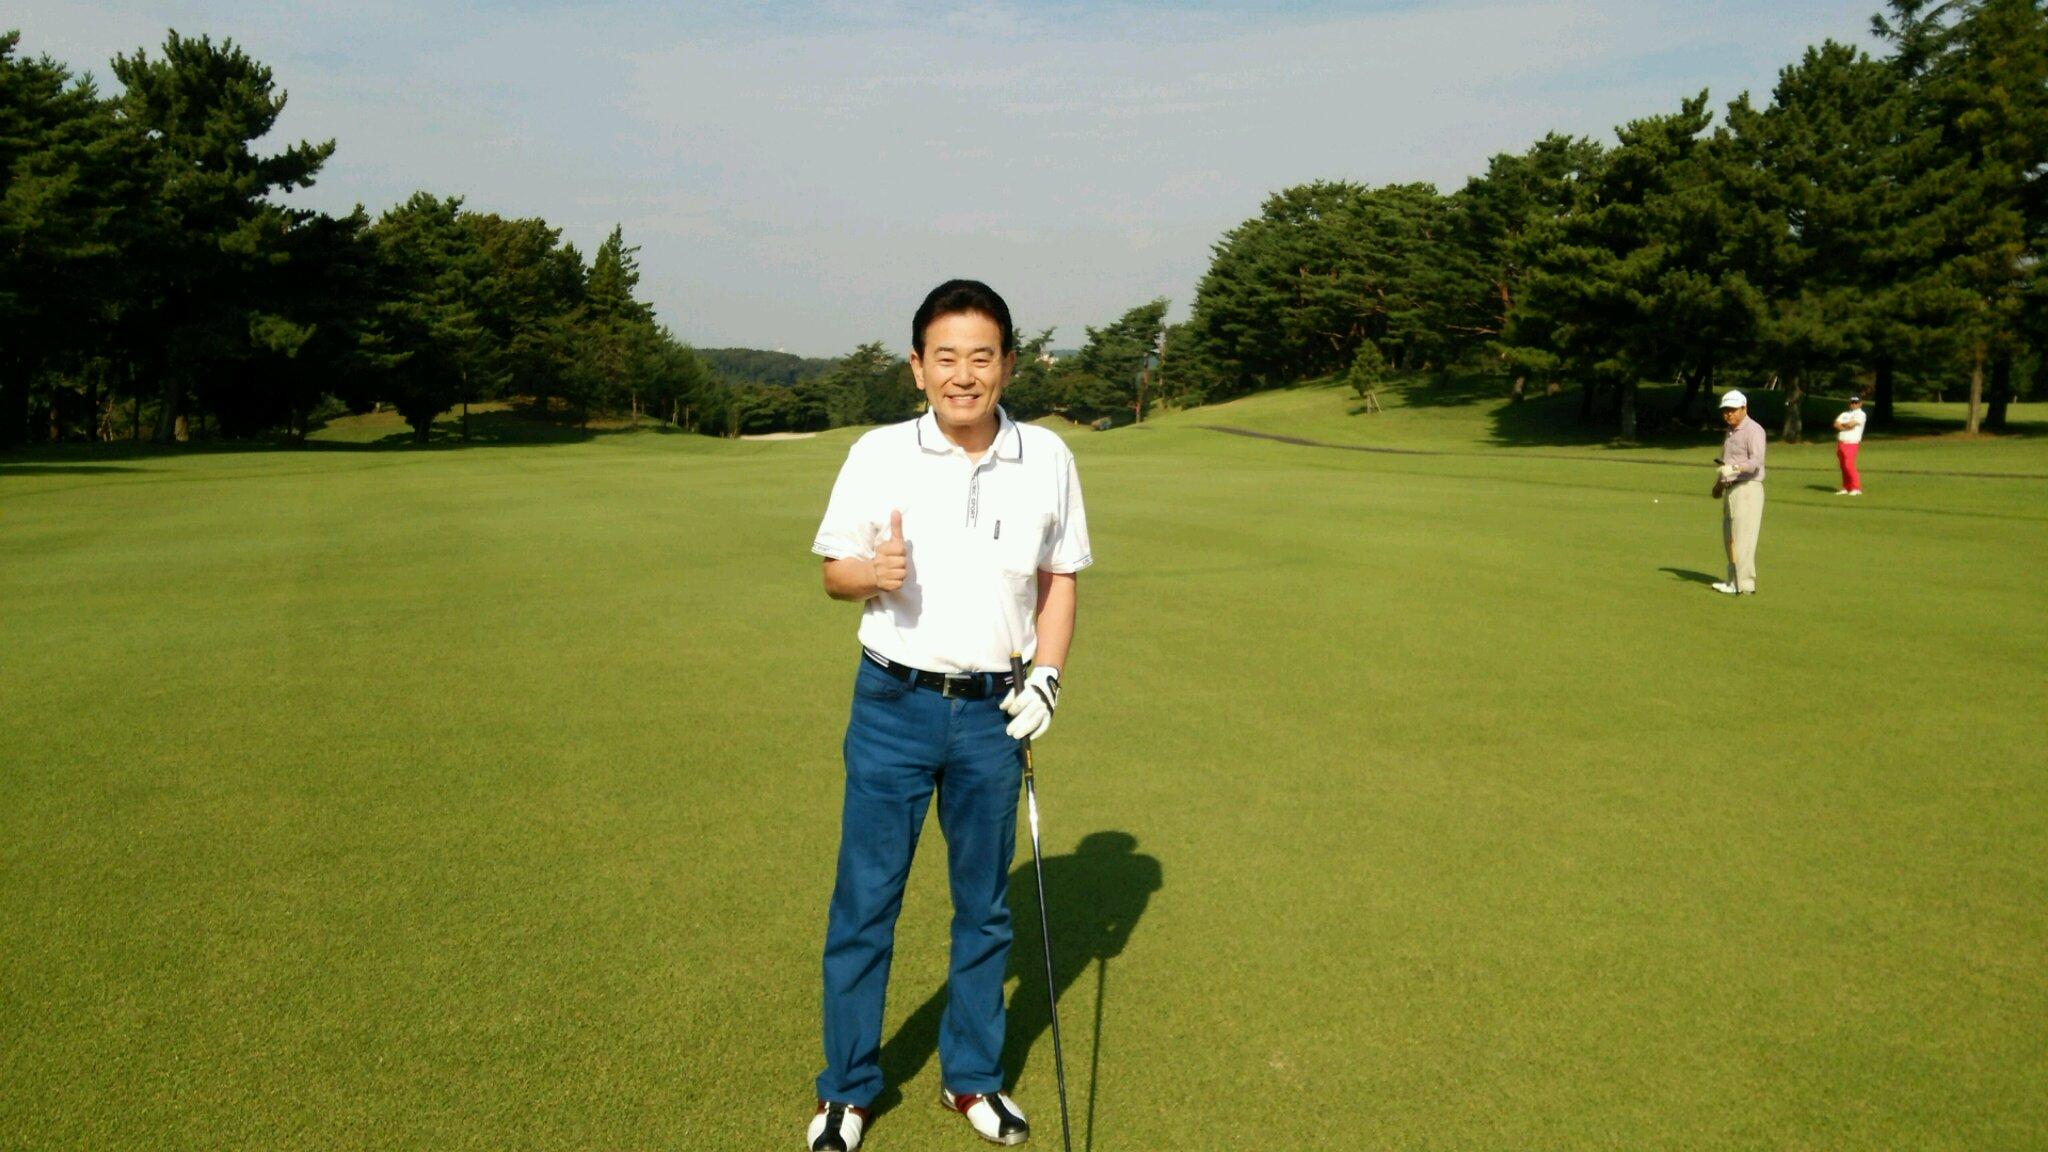 YK会ゴルフコンペで3位入賞!_e0119092_17062032.jpg